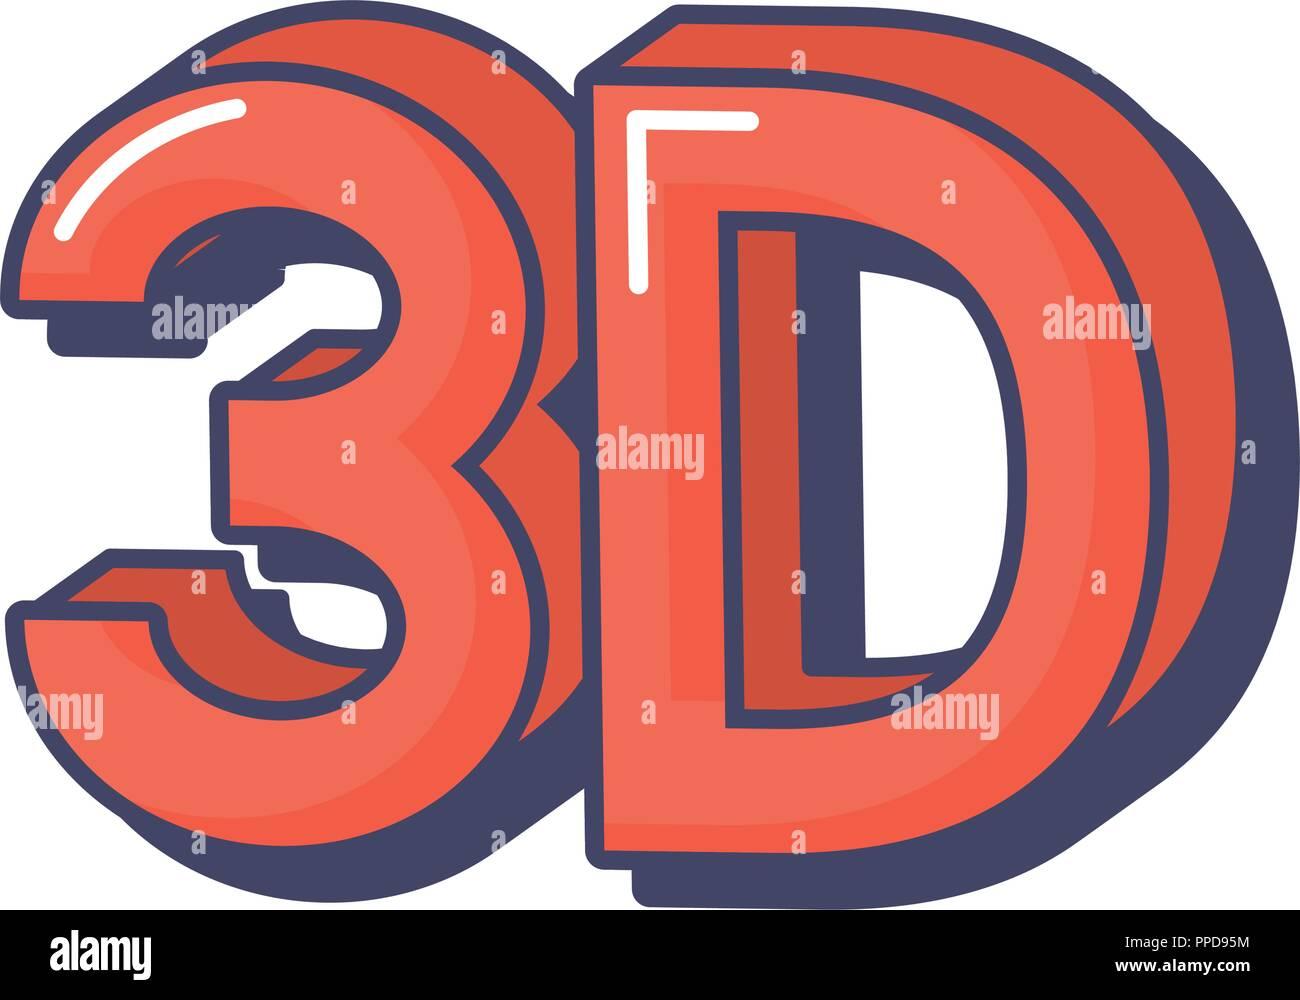 3d virtual digital technology innovation vector illustration - Stock Image